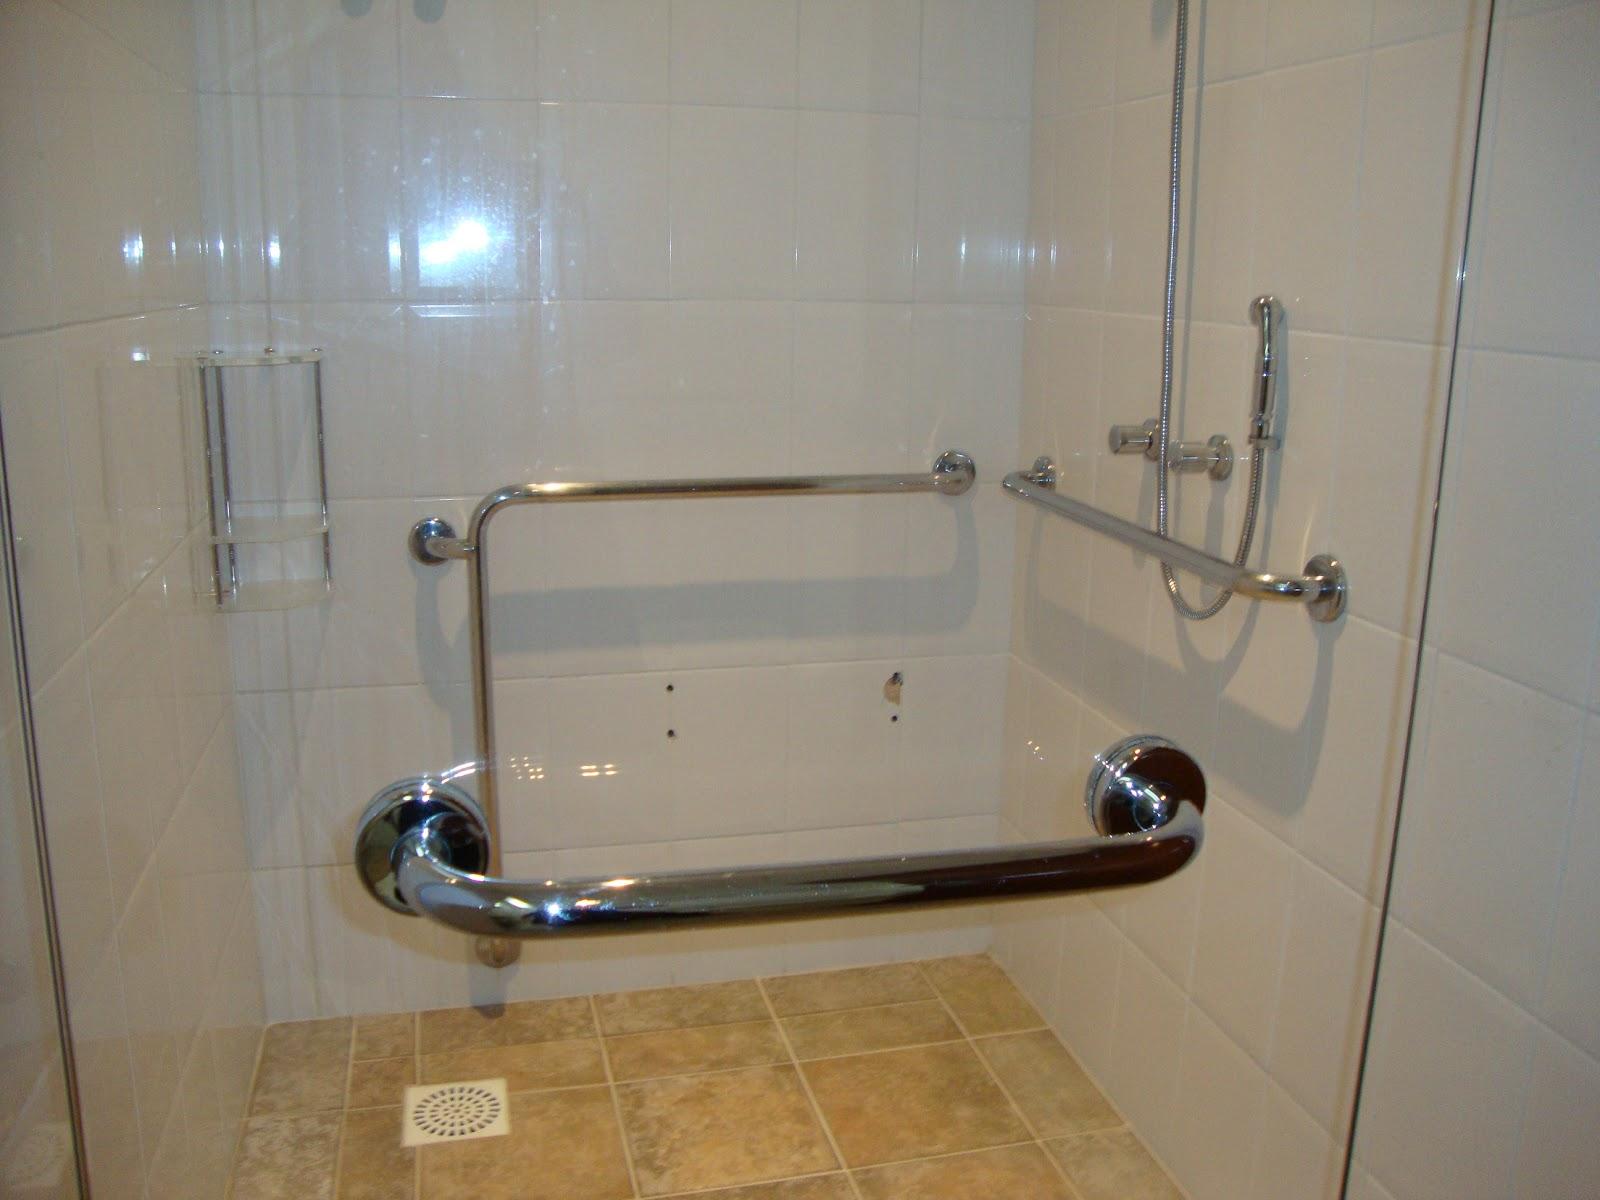 Banheiro De Deficiente 2 Picture #357296 1600 1200